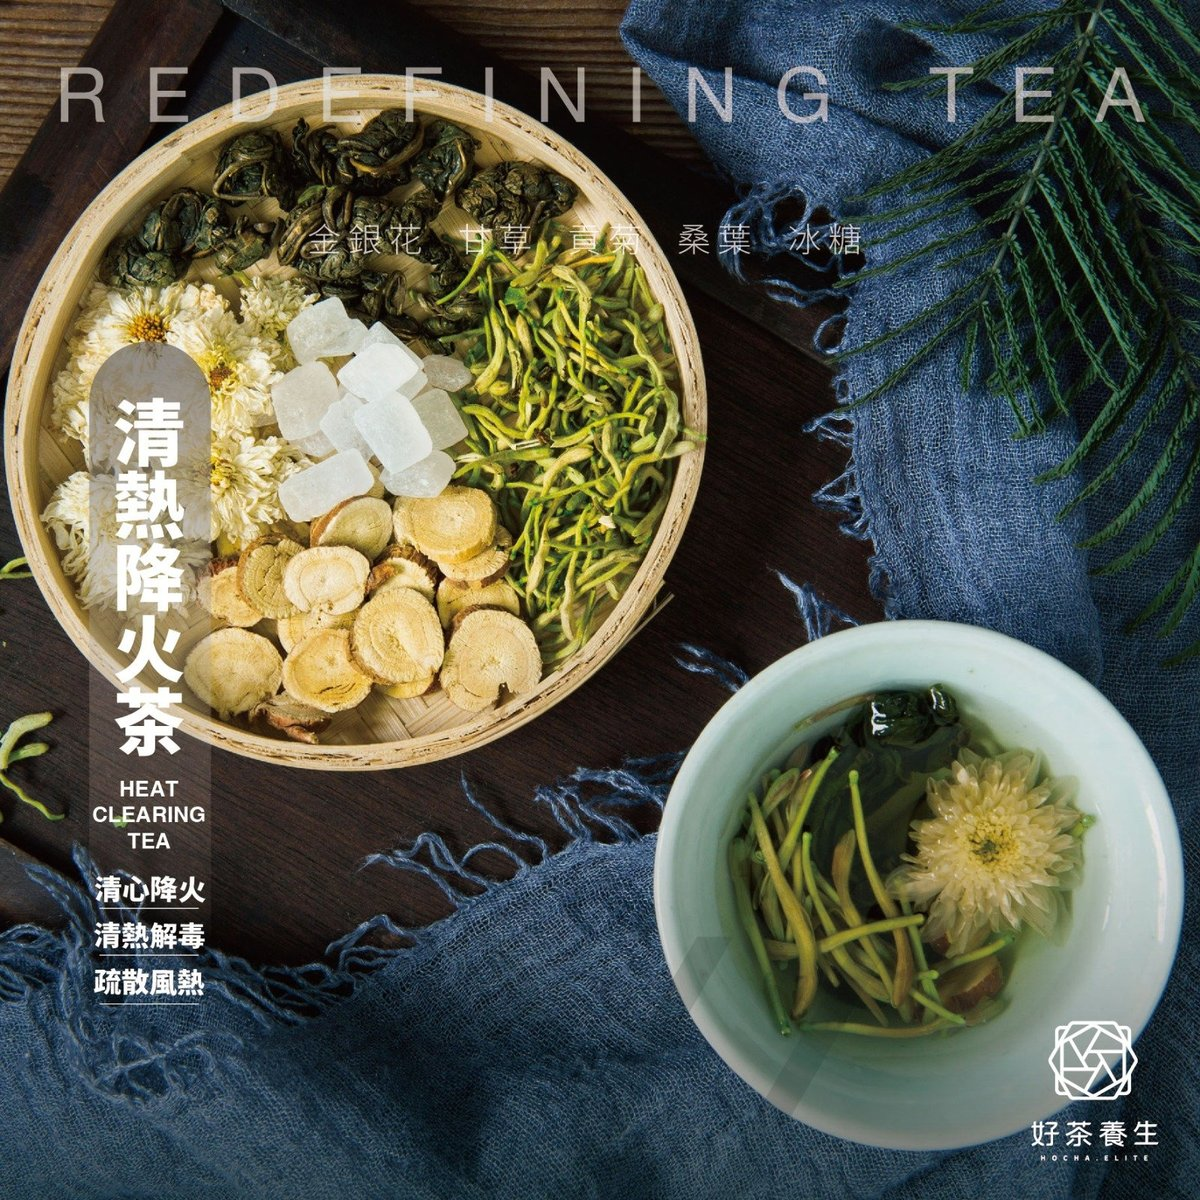 Heat Clearing Tea - Chinese Herbal Tea